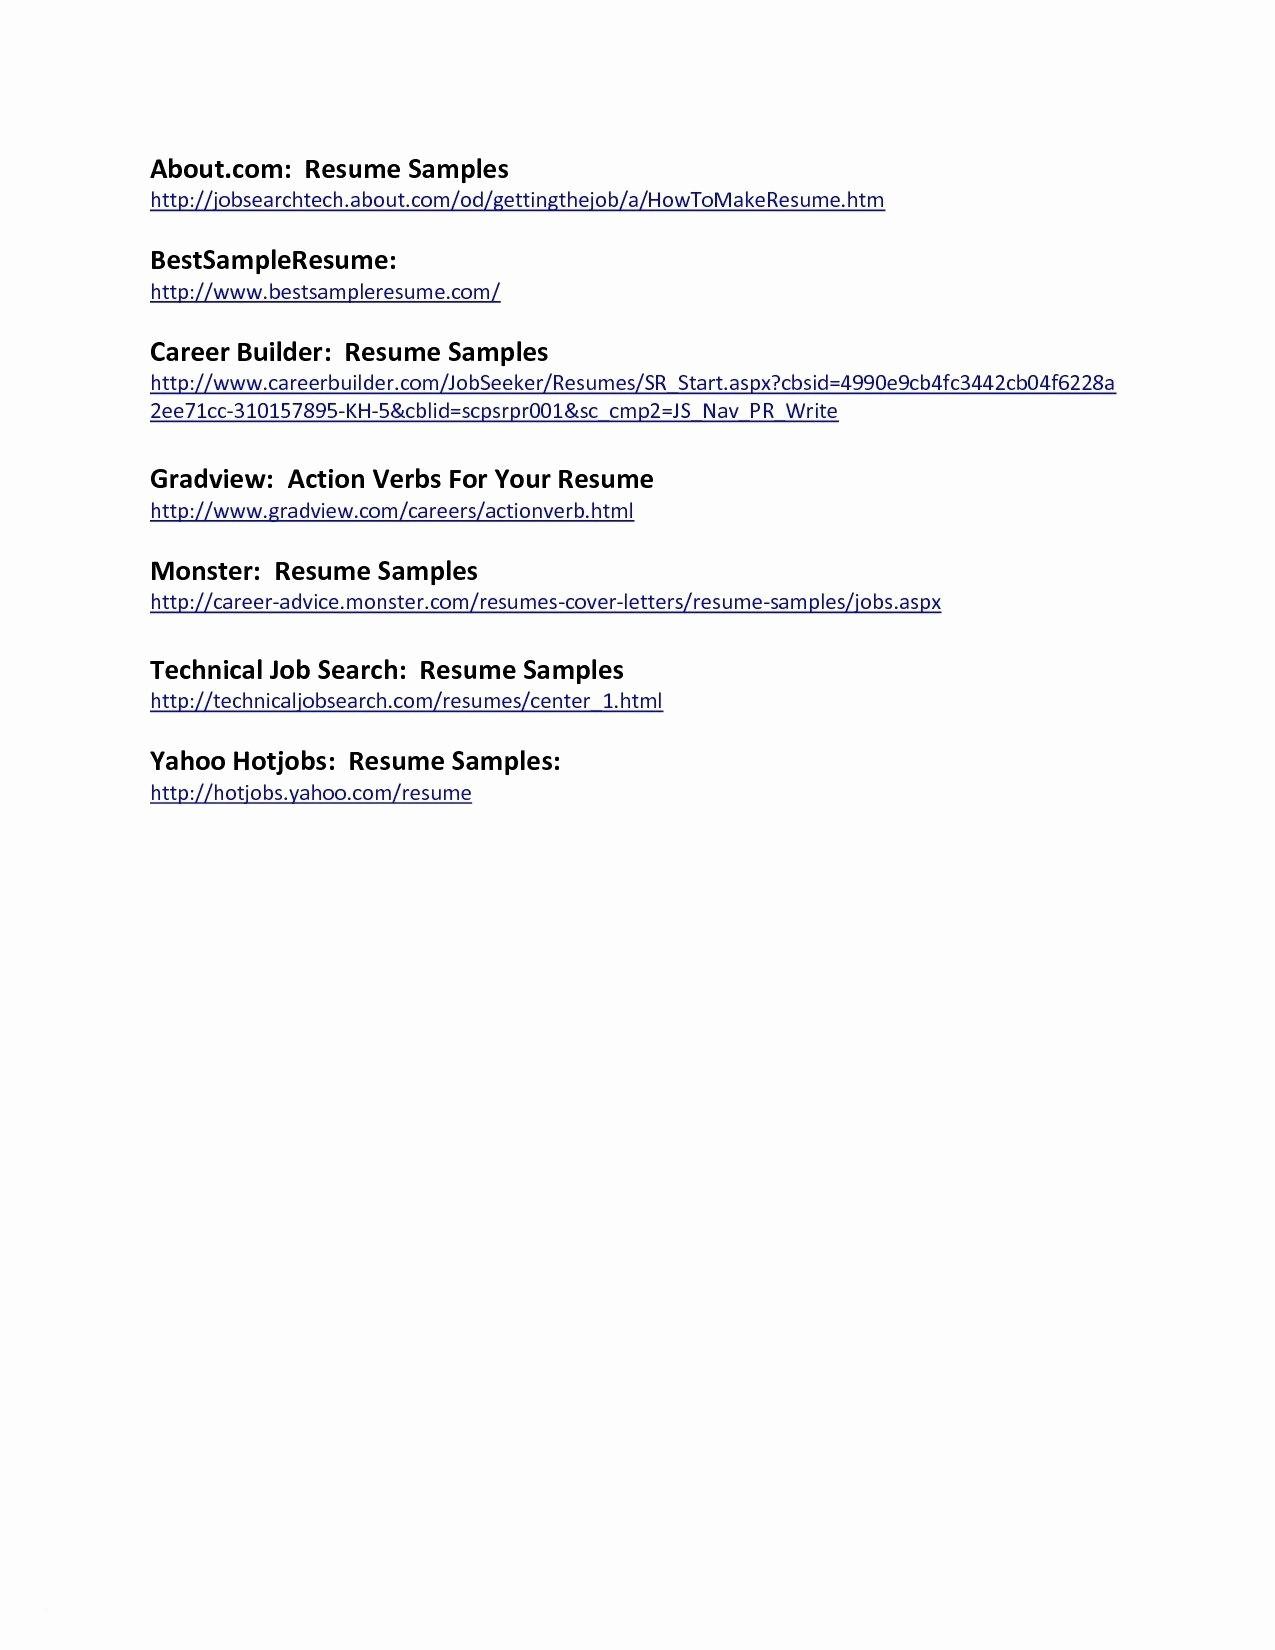 Microsoft Word Resume Templates 2014 New Microsoft Word Resume Template 2014